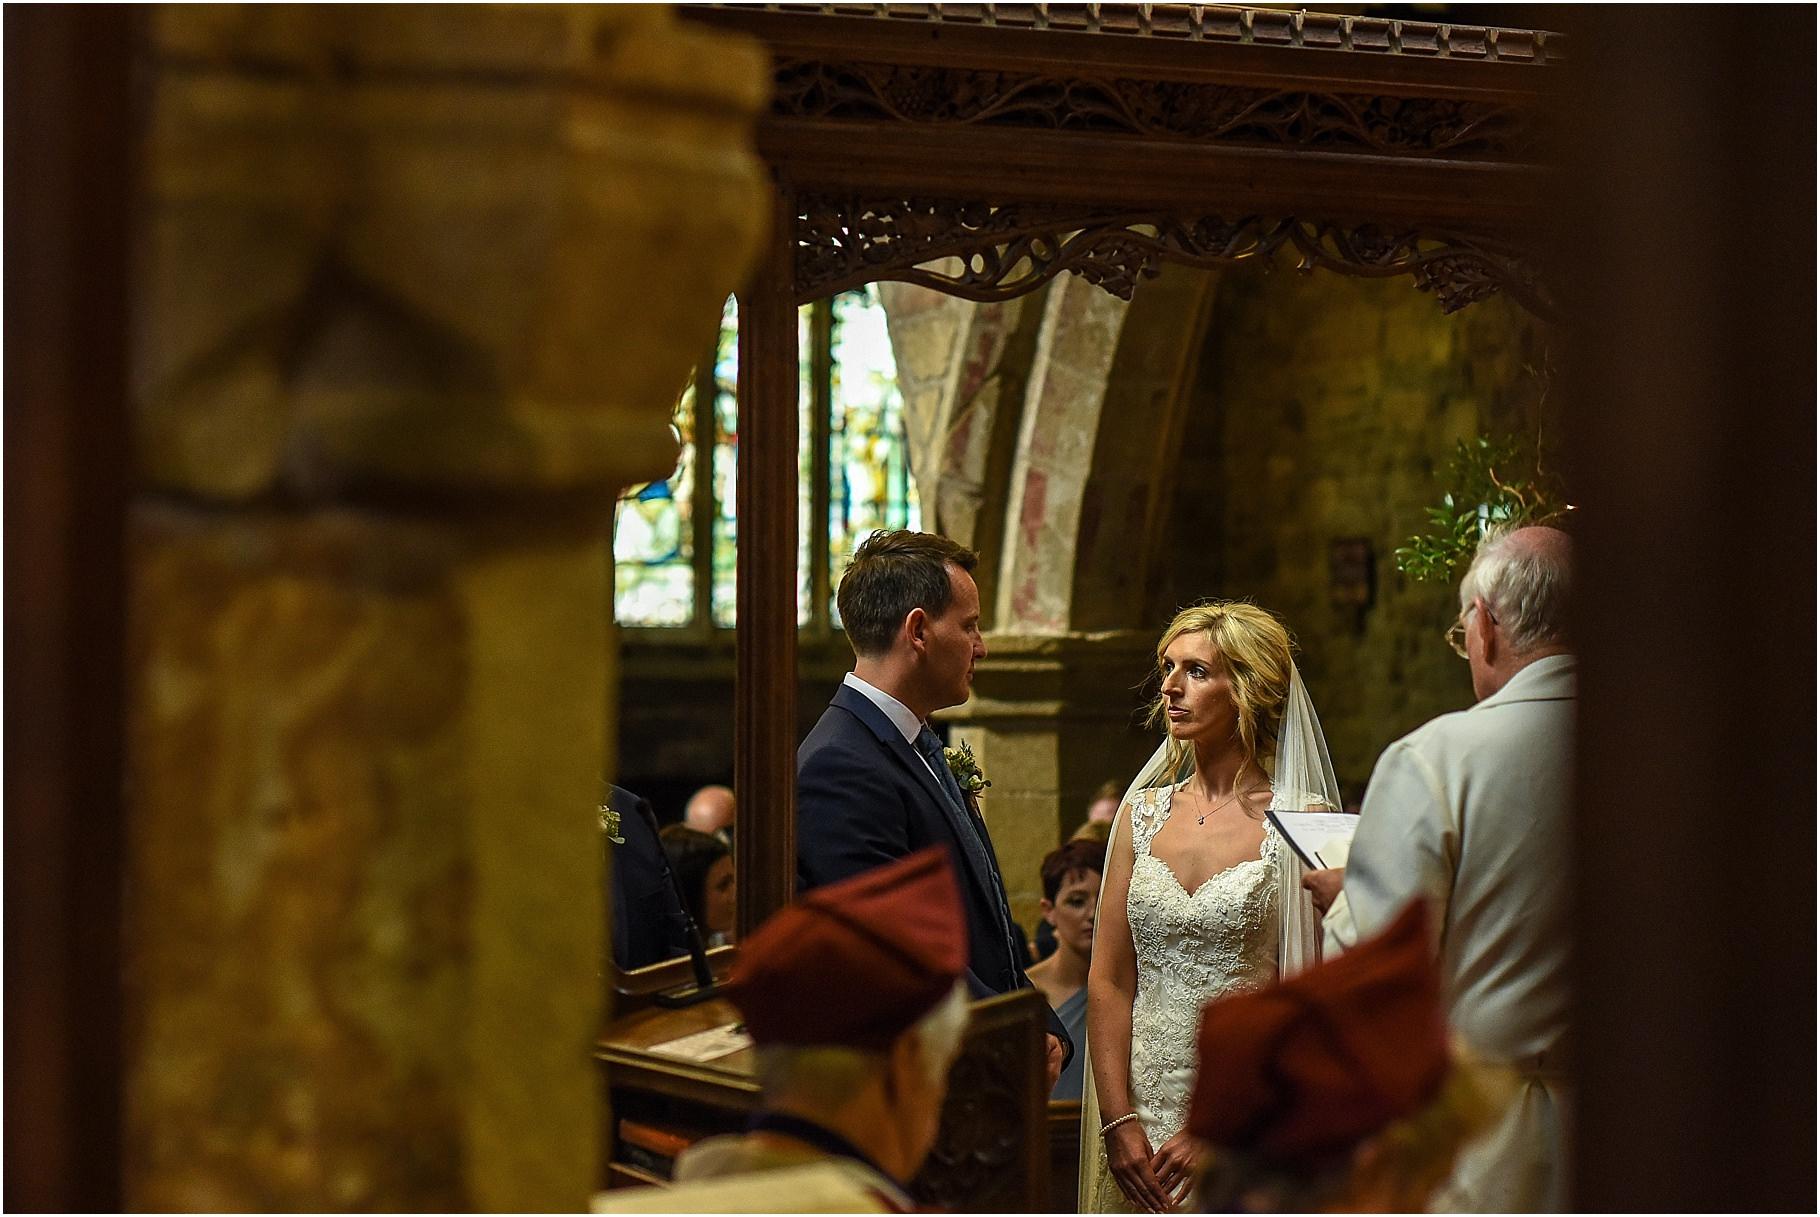 bartle-hall-wedding-photography-037.jpg